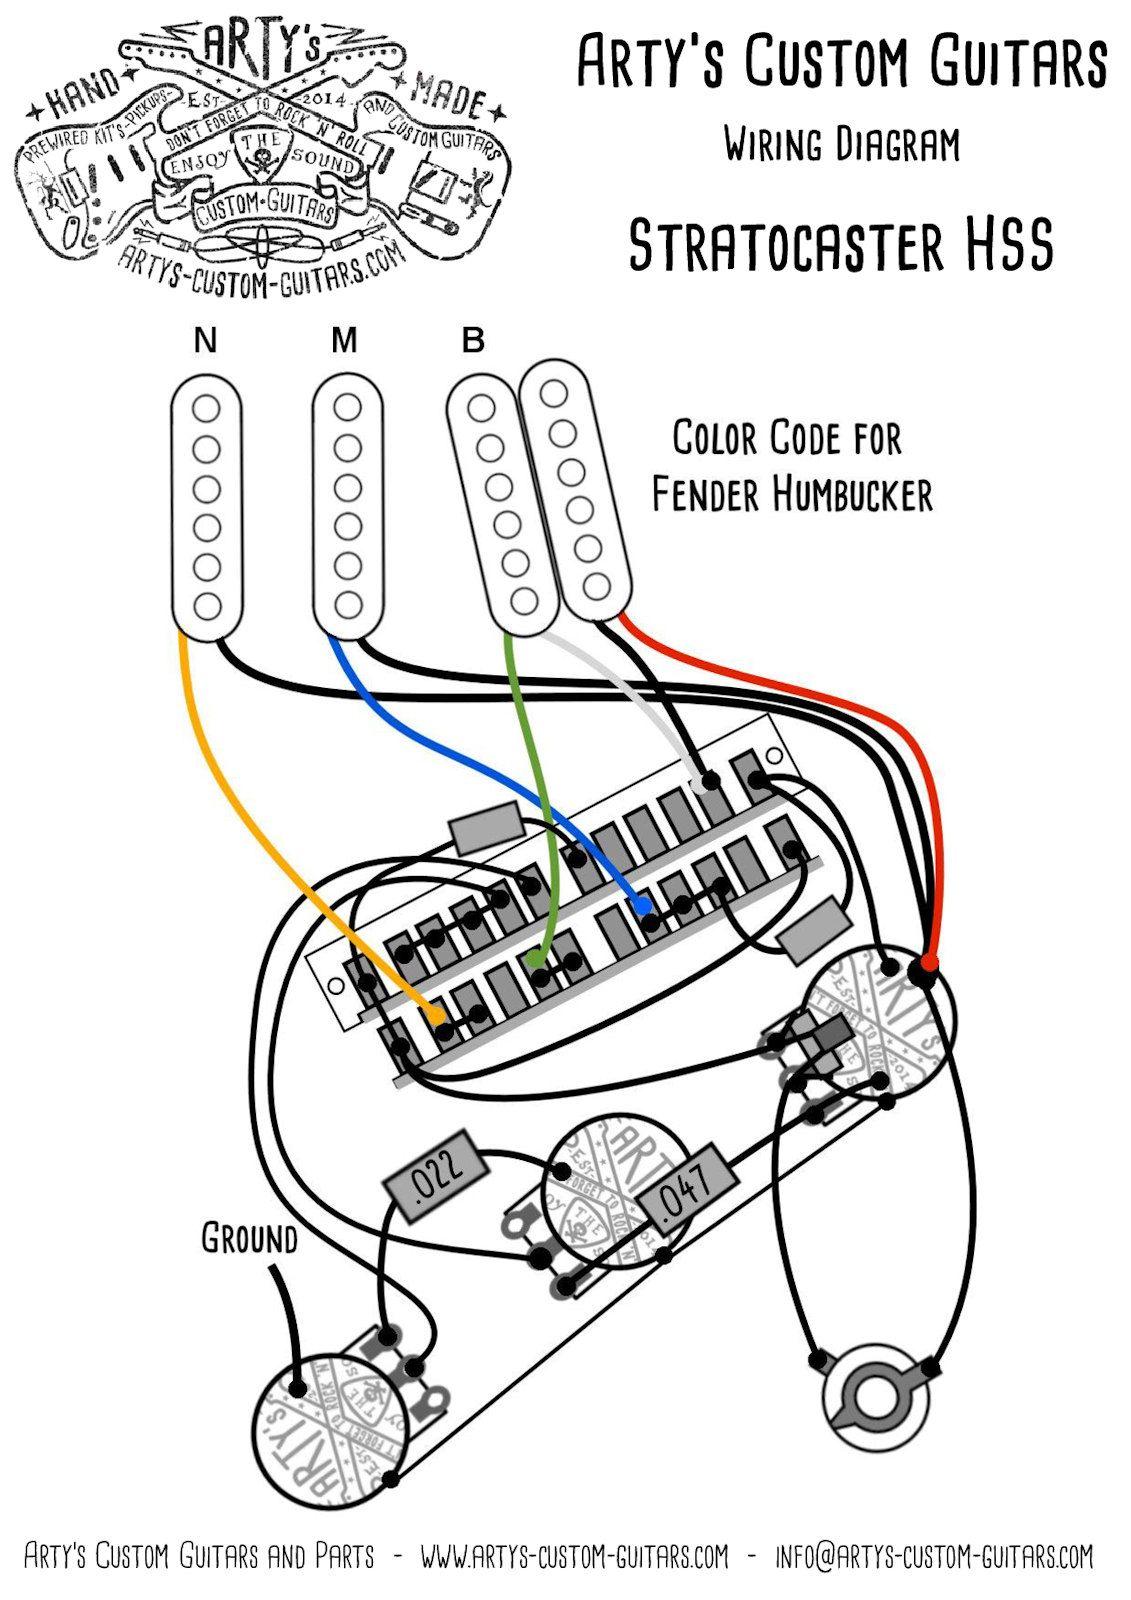 [RE_0854] Super Strat Wiring Diagram Wiring Diagram